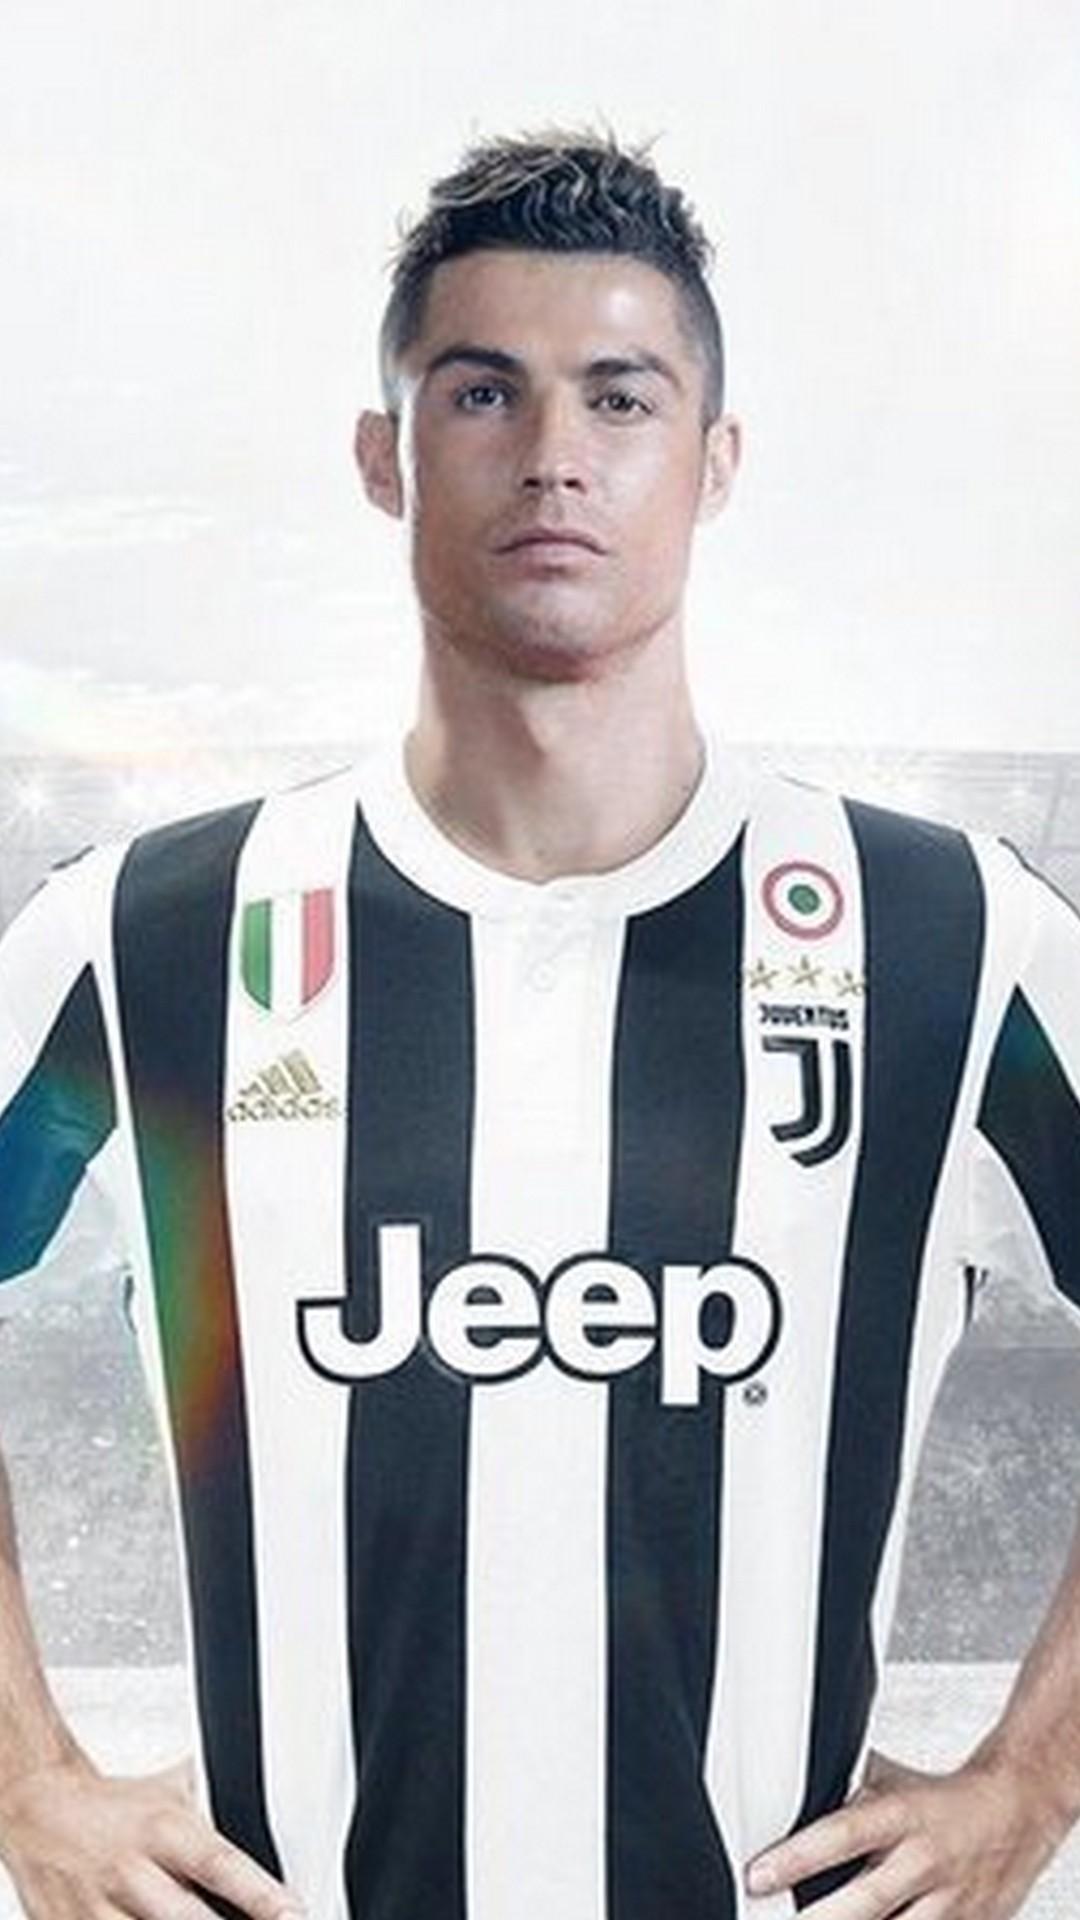 Wallpaper C Ronaldo Juventus iPhone 2020 3D iPhone Wallpaper 1080x1920